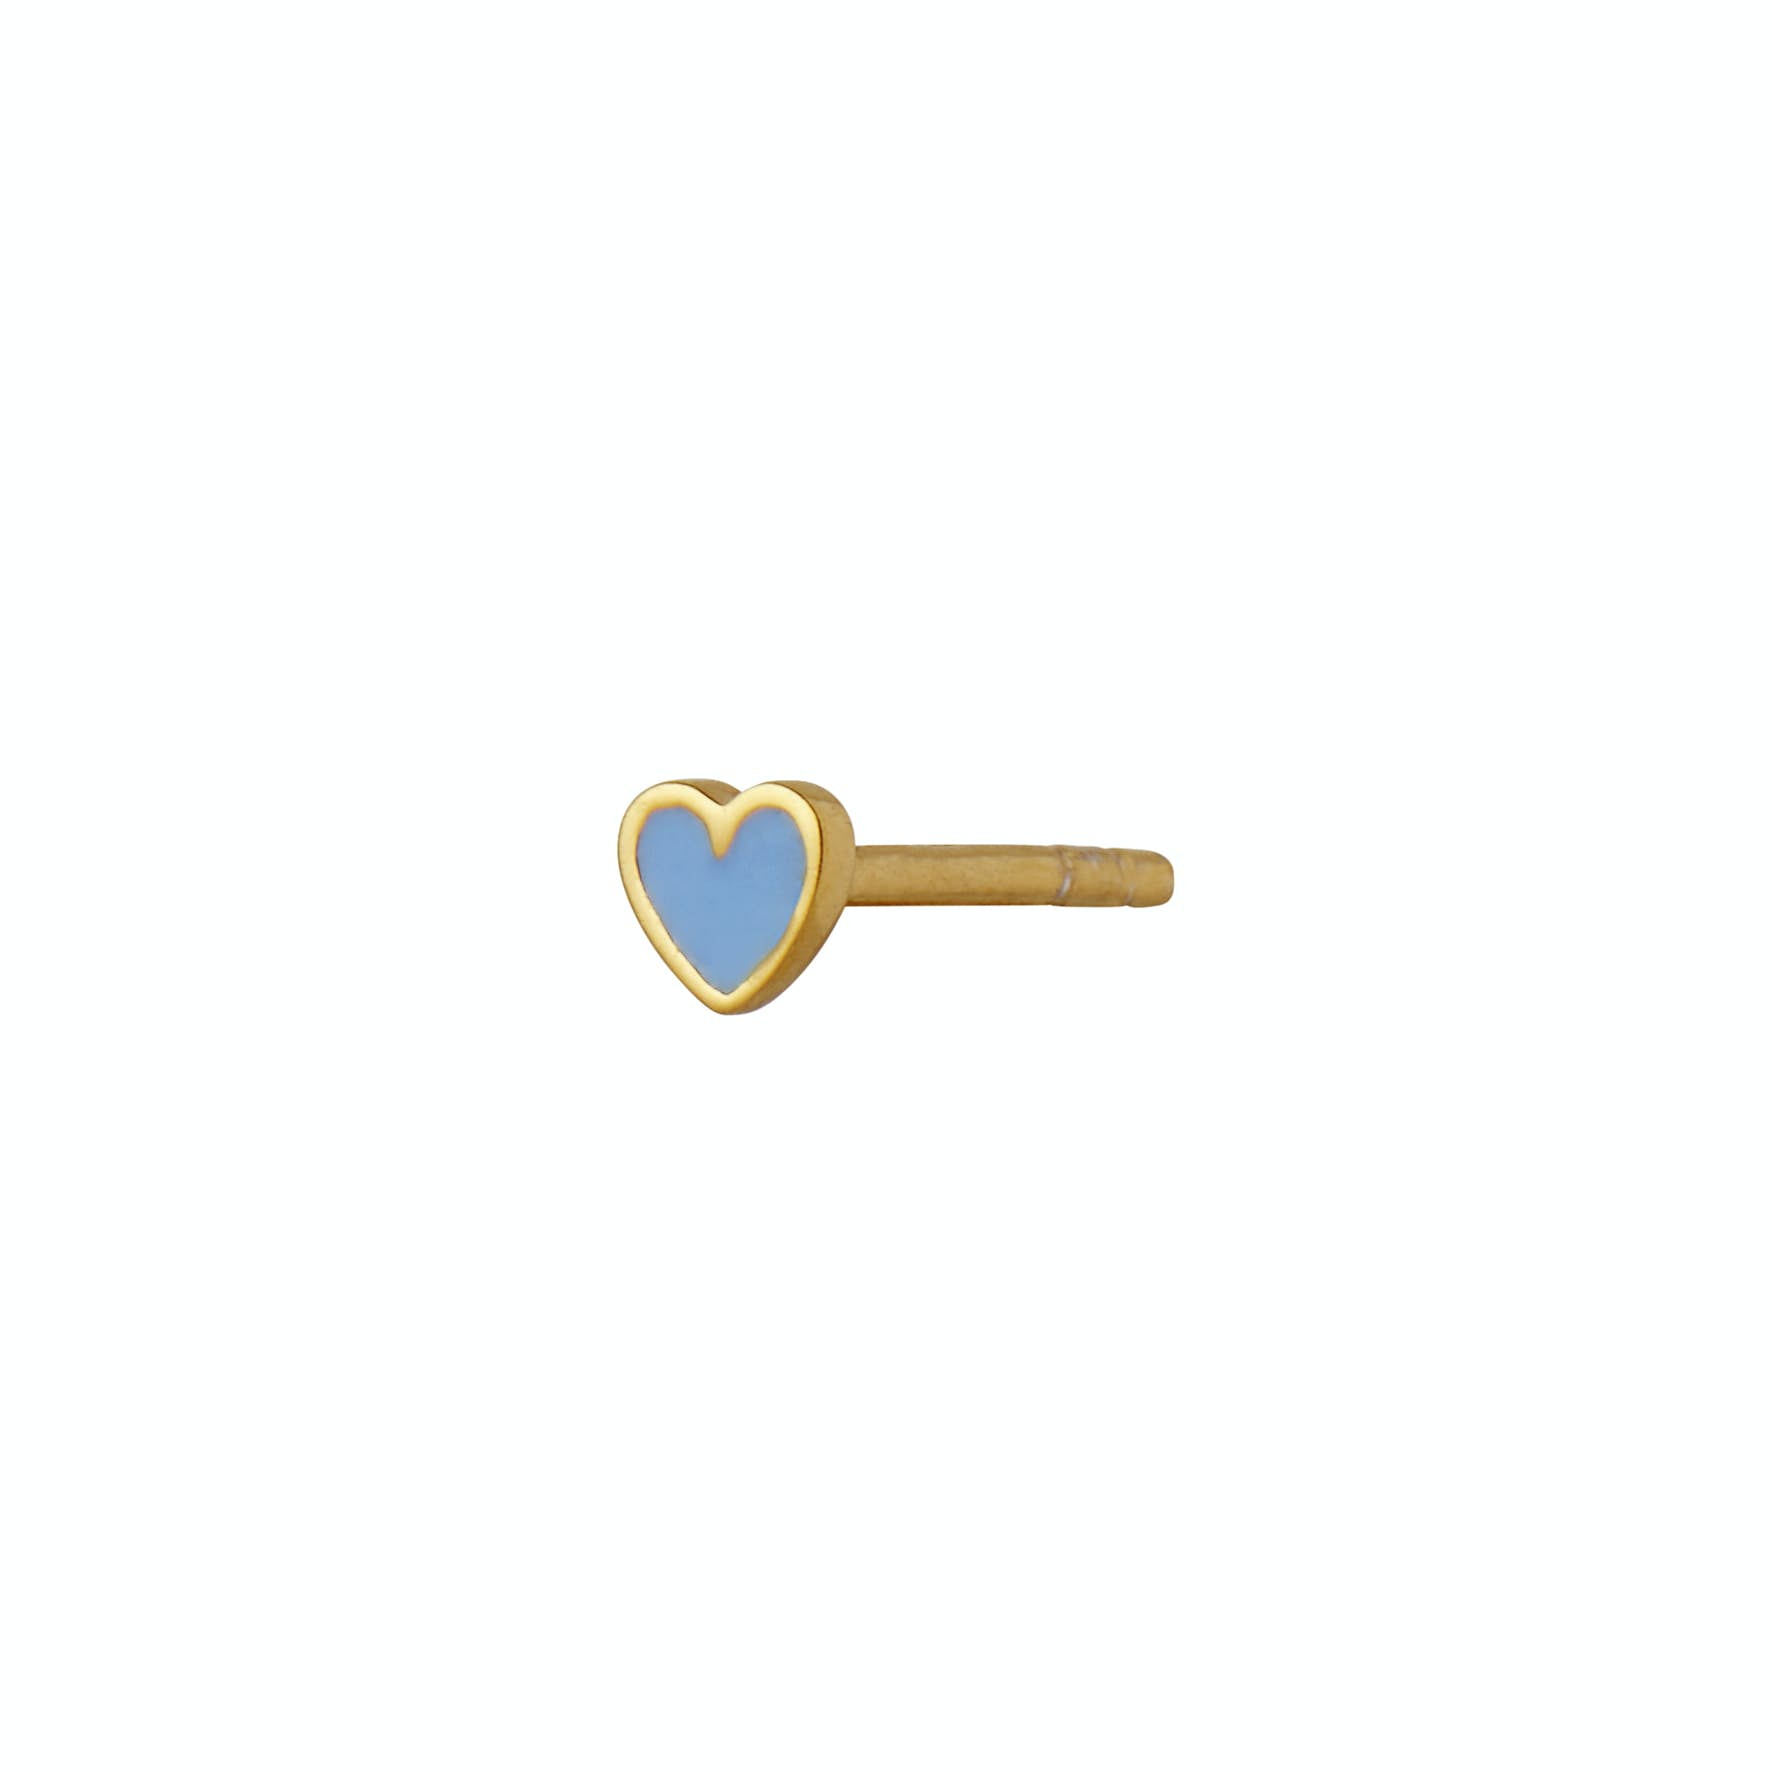 Petit Love Heart Earstick Light Blue fra STINE A Jewelry i Forgyldt-Sølv Sterling 925